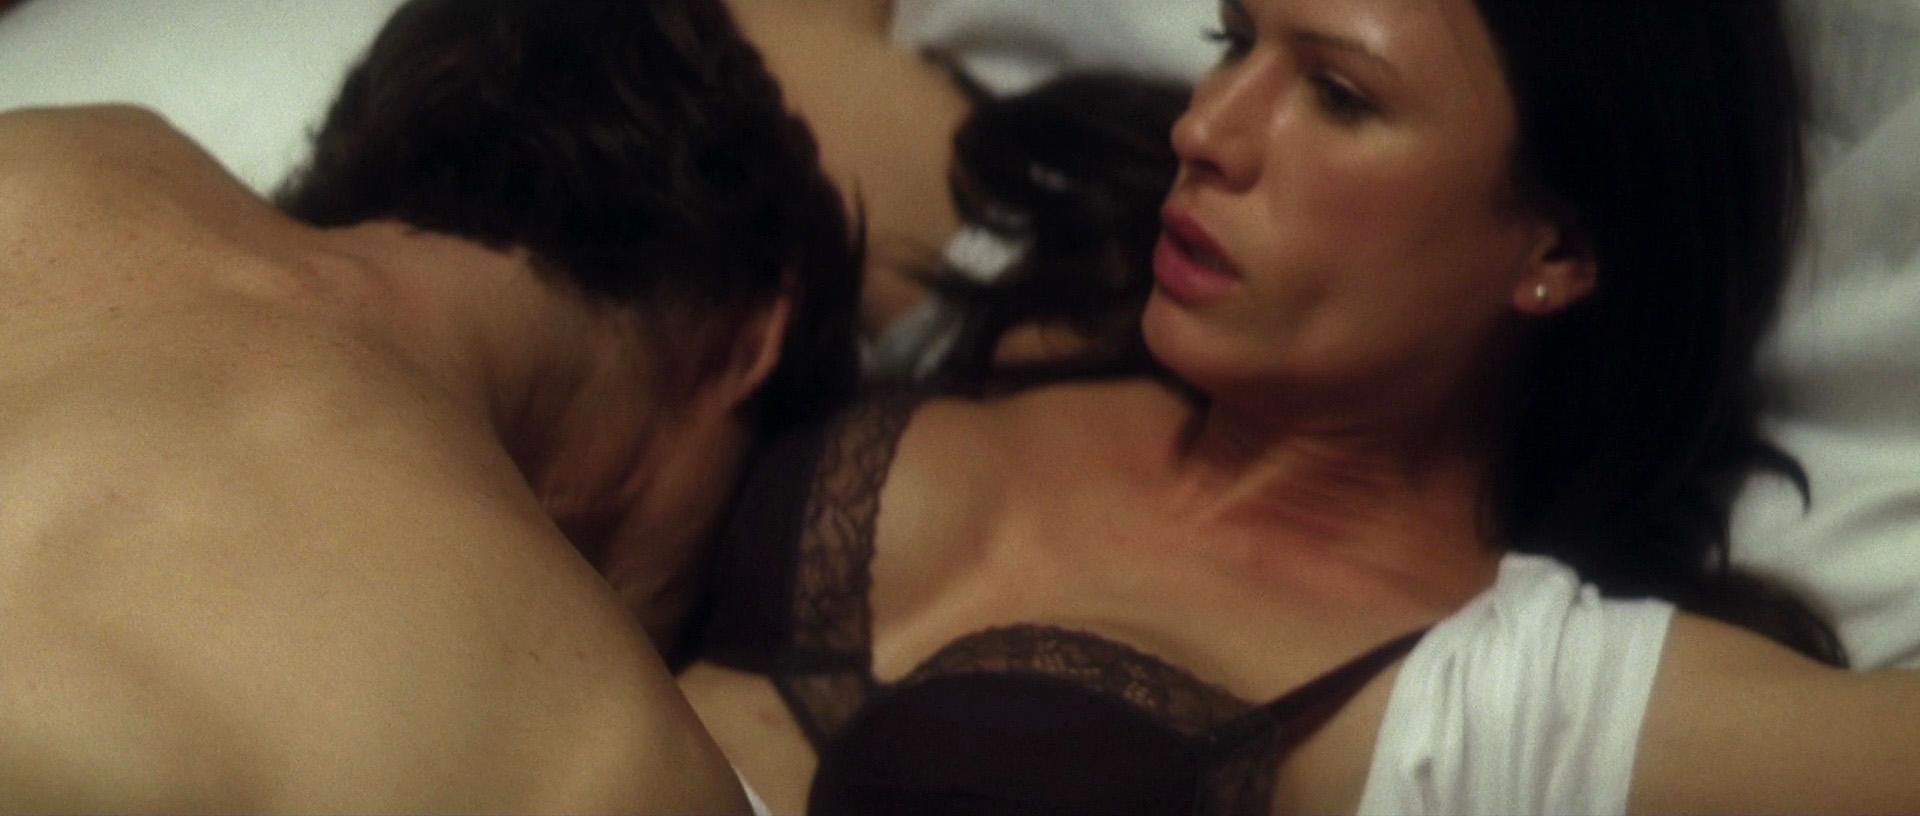 Tits Rhona Mitra Nude Movies Gif